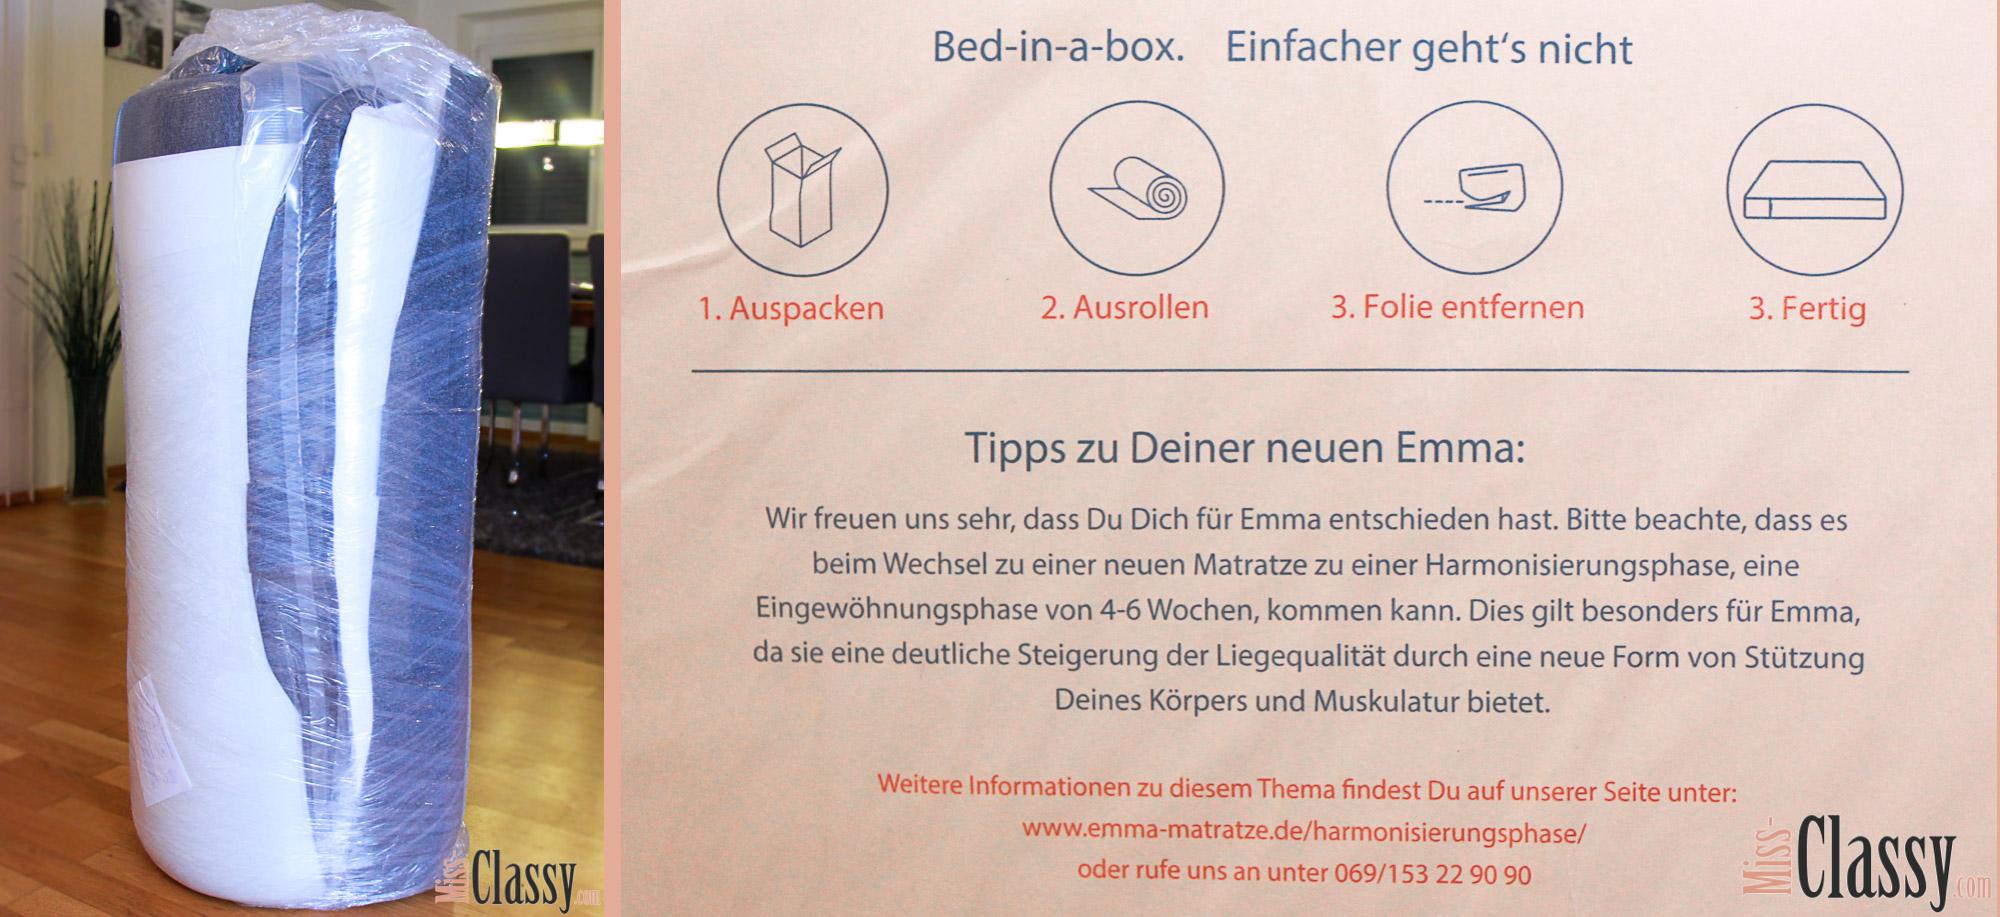 lifestyle im bett mit emma miss classy. Black Bedroom Furniture Sets. Home Design Ideas